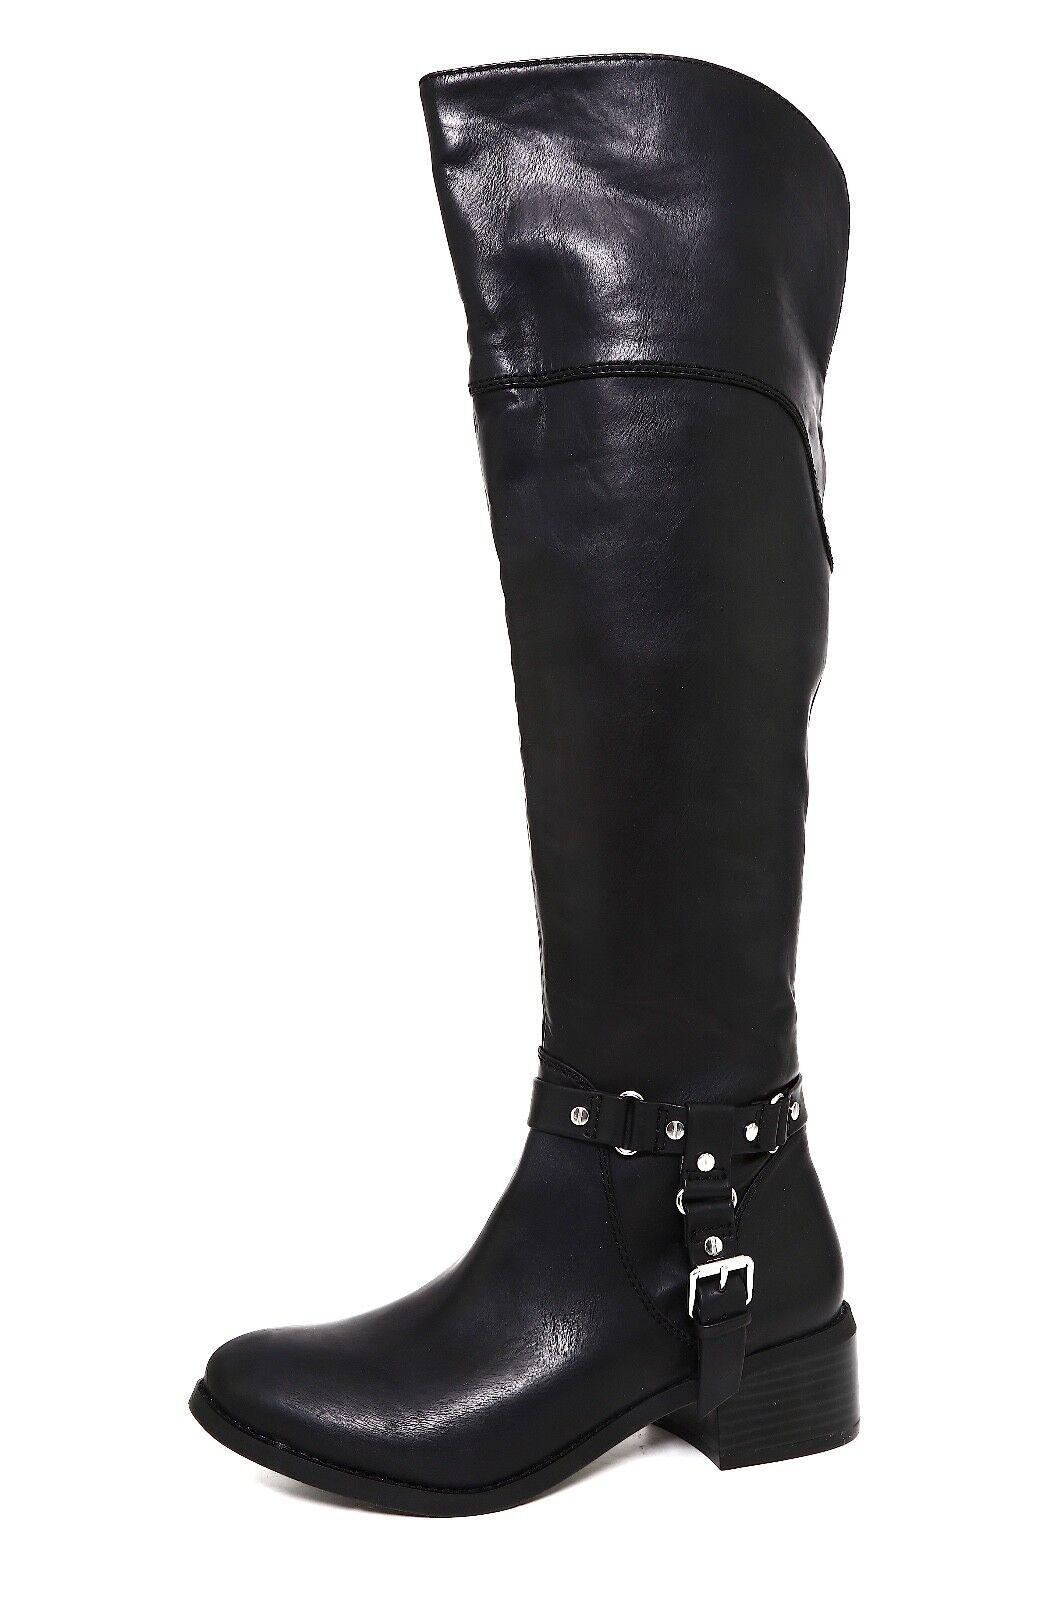 Dolce Vita Over Knee Side Zip Leather Boot Black Women Sz 7.5 5769 *